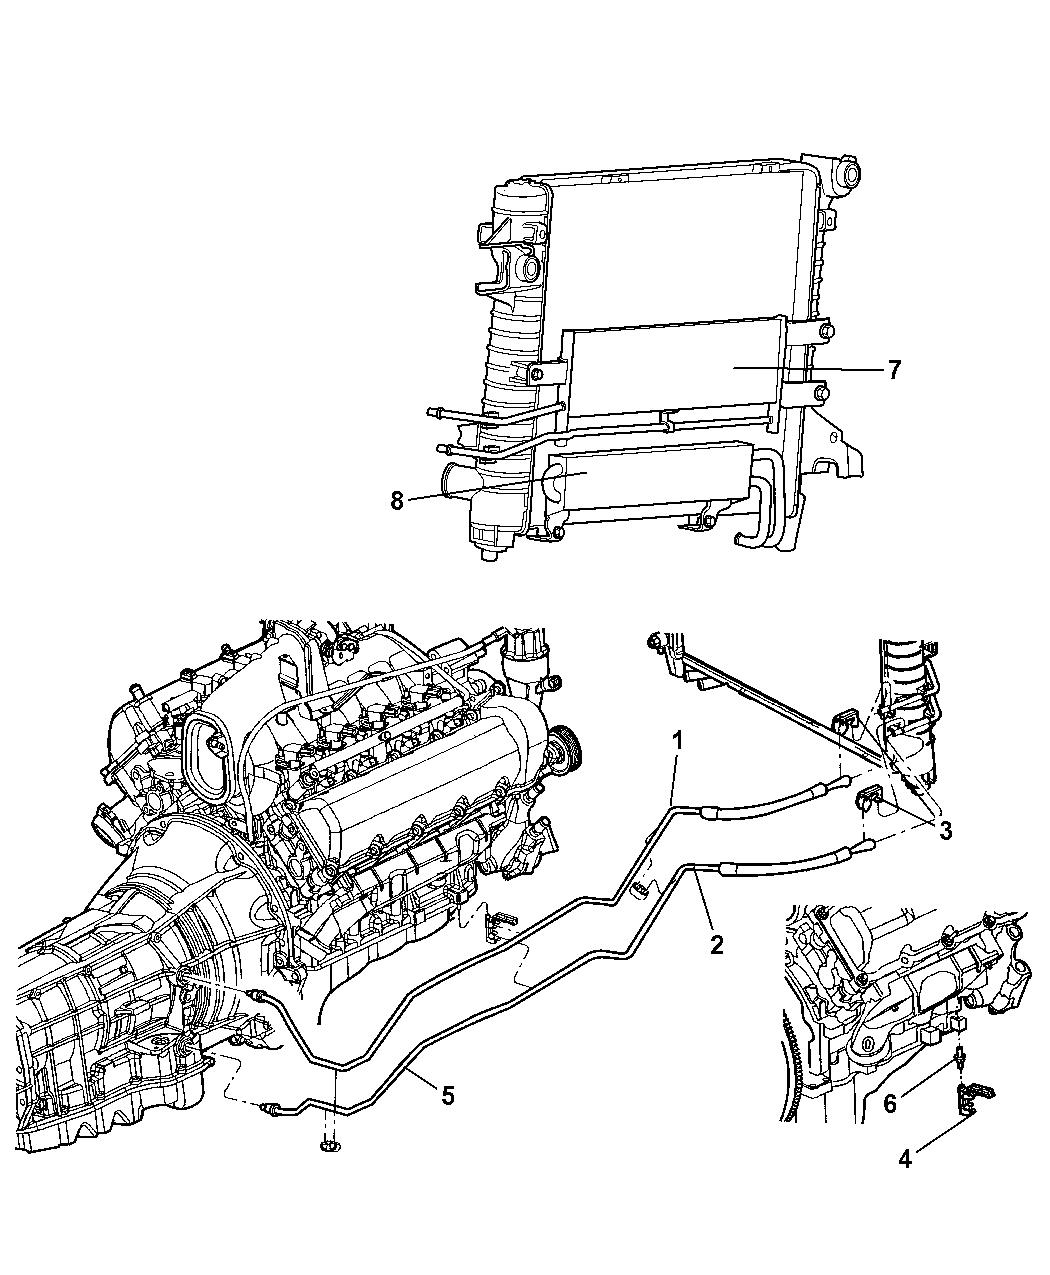 2002 dodge ram 1500 4.7 engine oil capacity